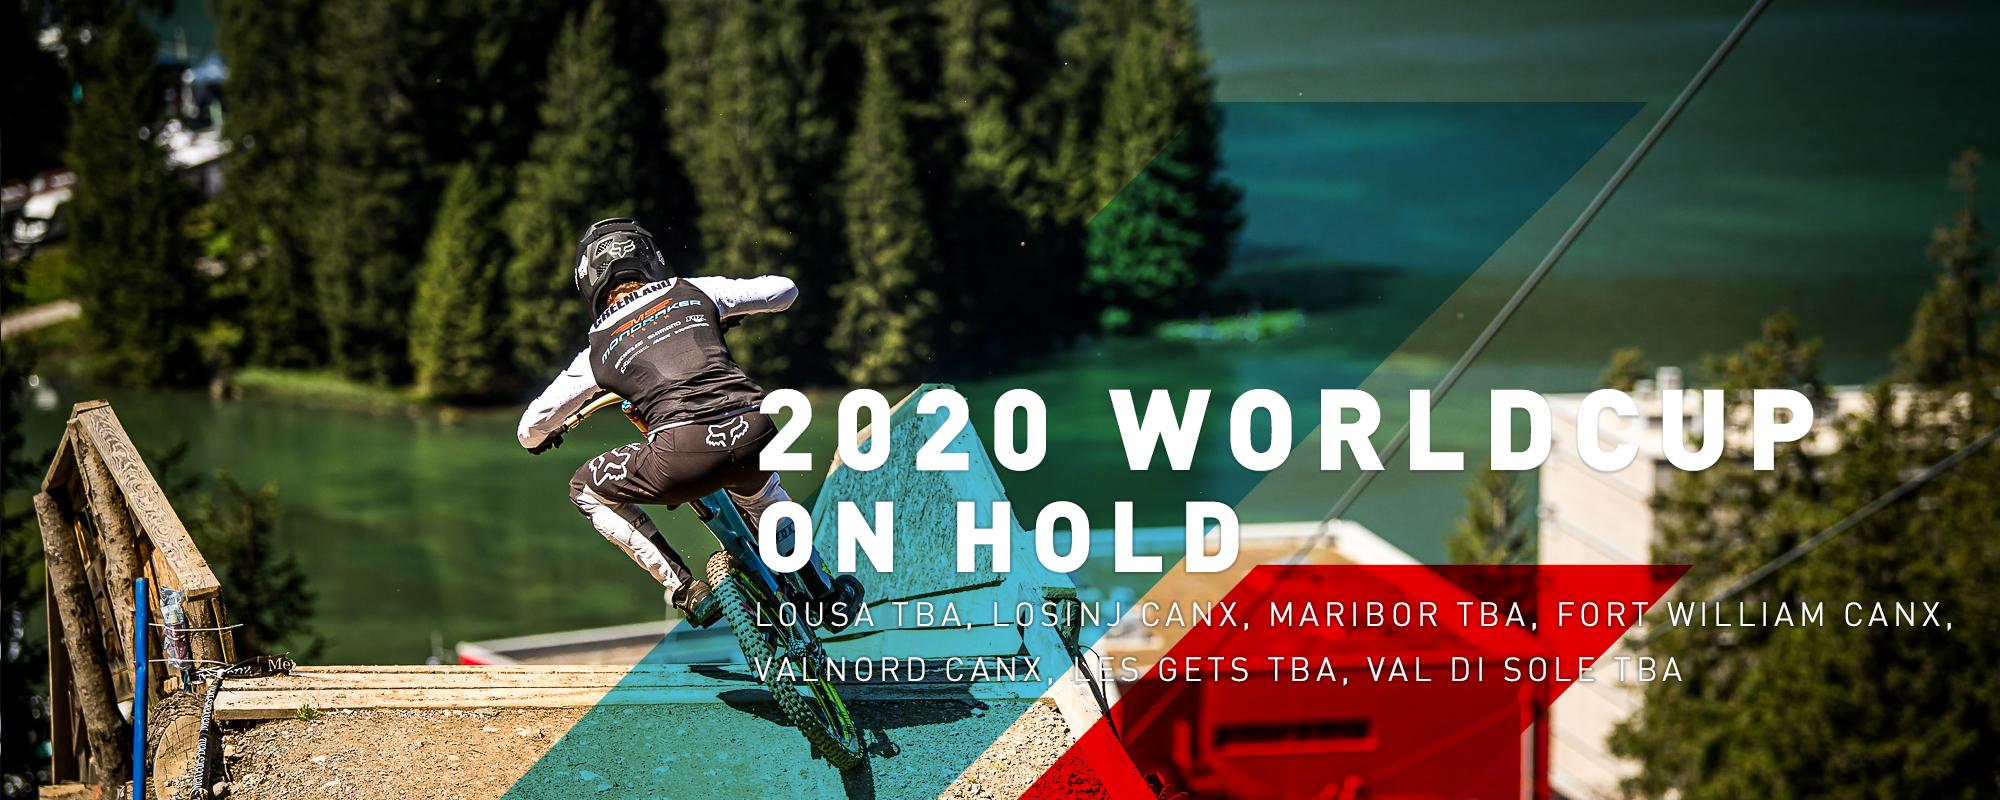 2020websiteheader